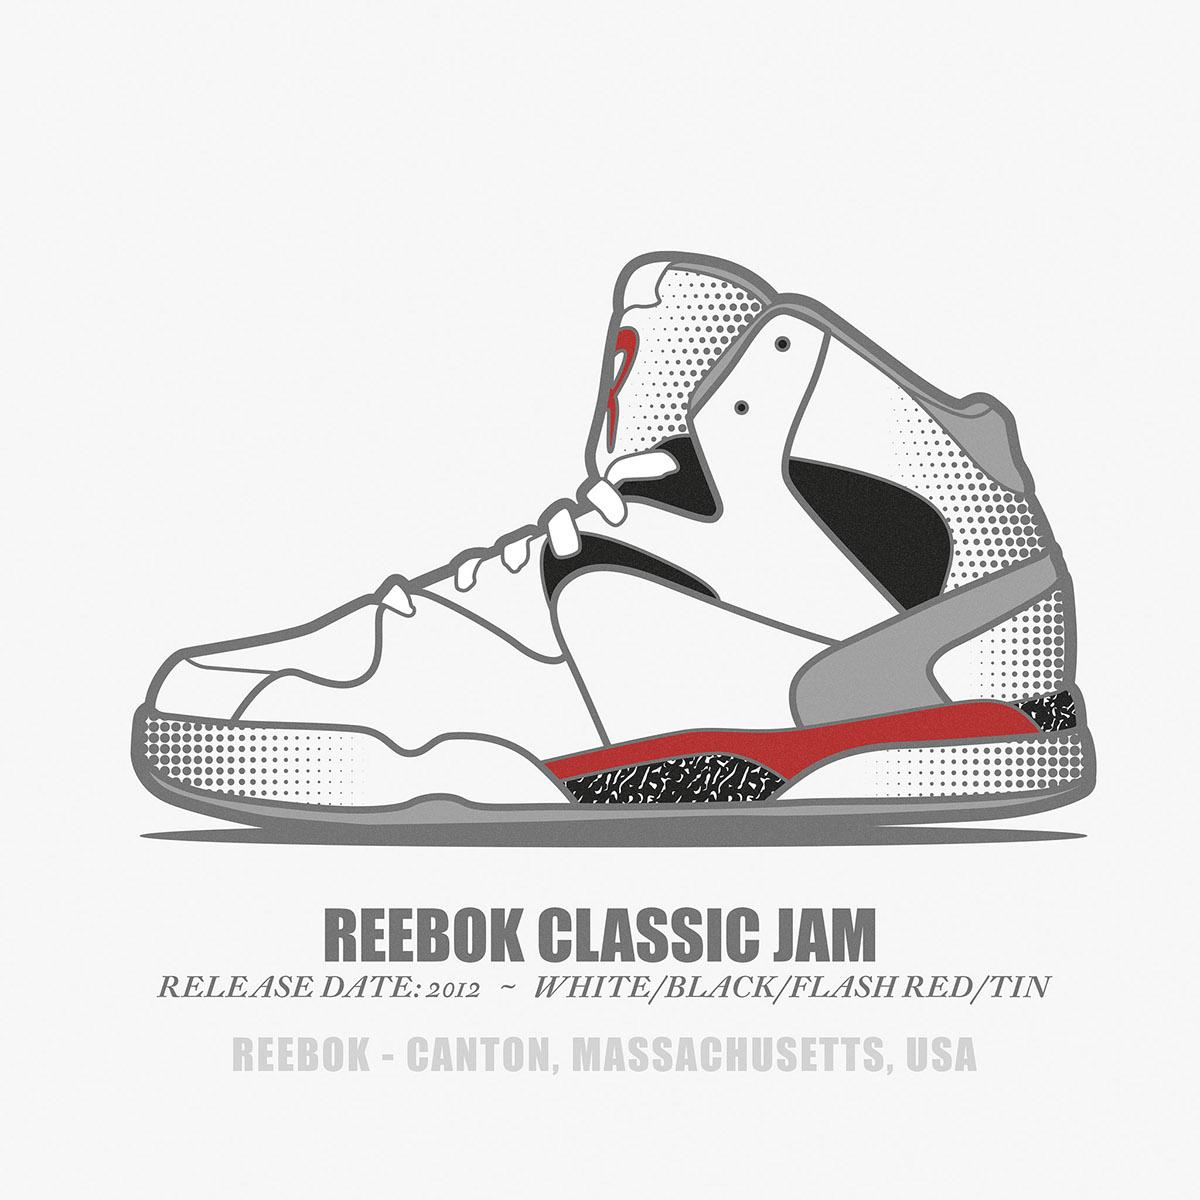 796a4eb9363d2  012 Reebok Classic Jam - http   sneakercoolture.virb.com 012-reebok -classic-jam